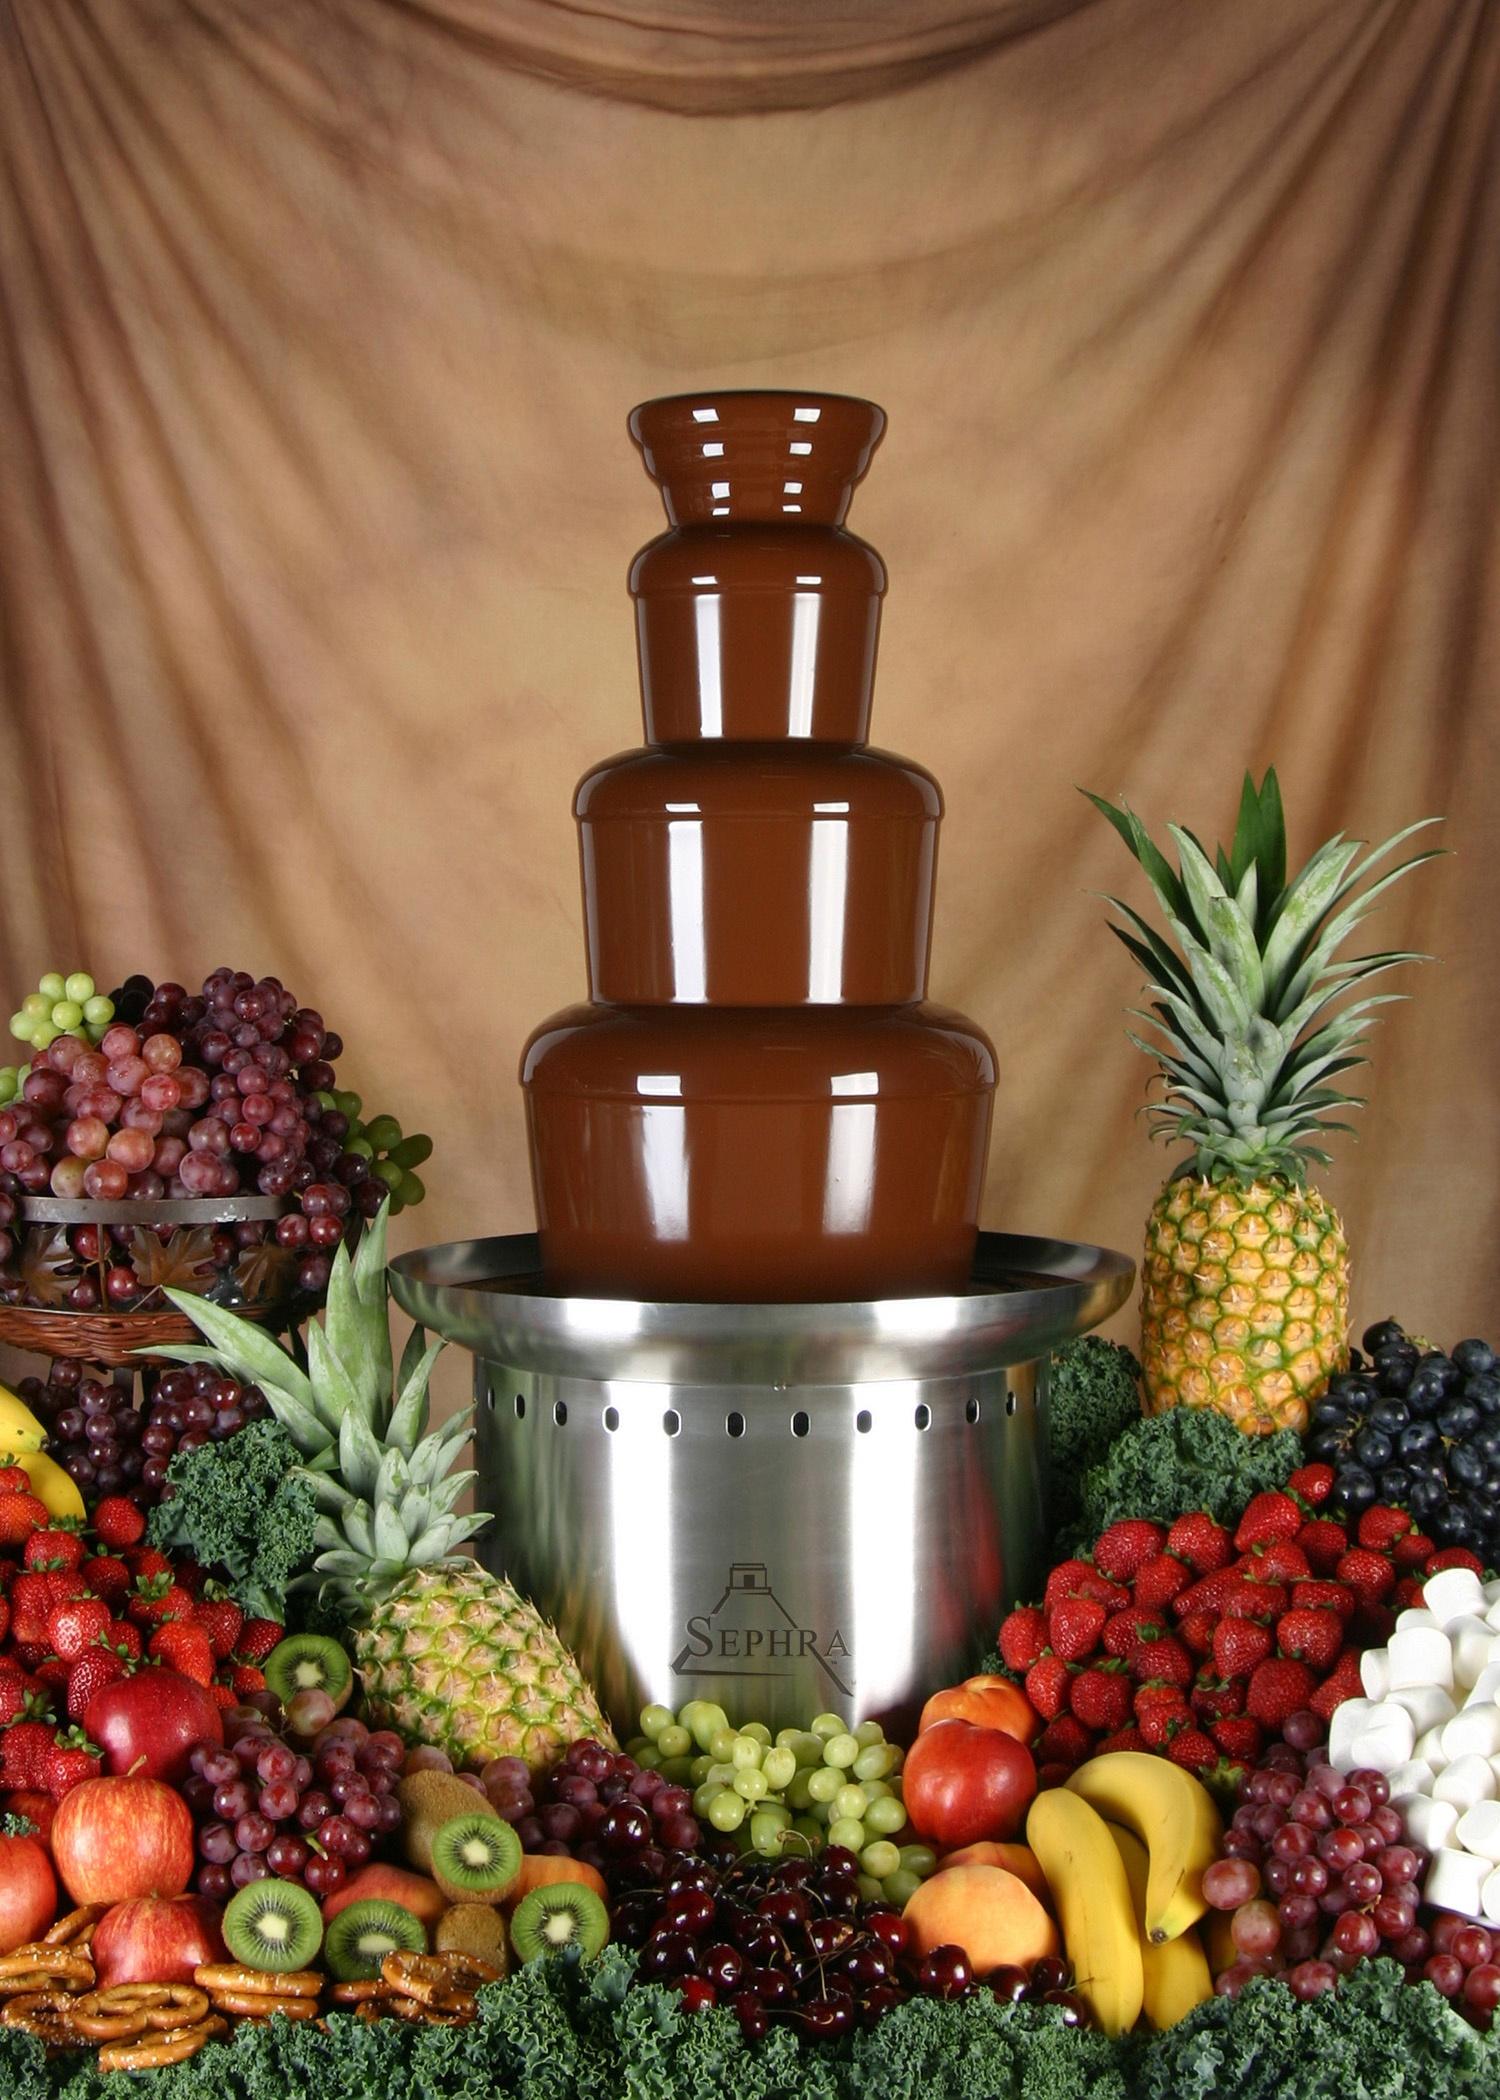 Sephra 10150 - Aztec Chocolate Fountain, 27 in., (3) Tier